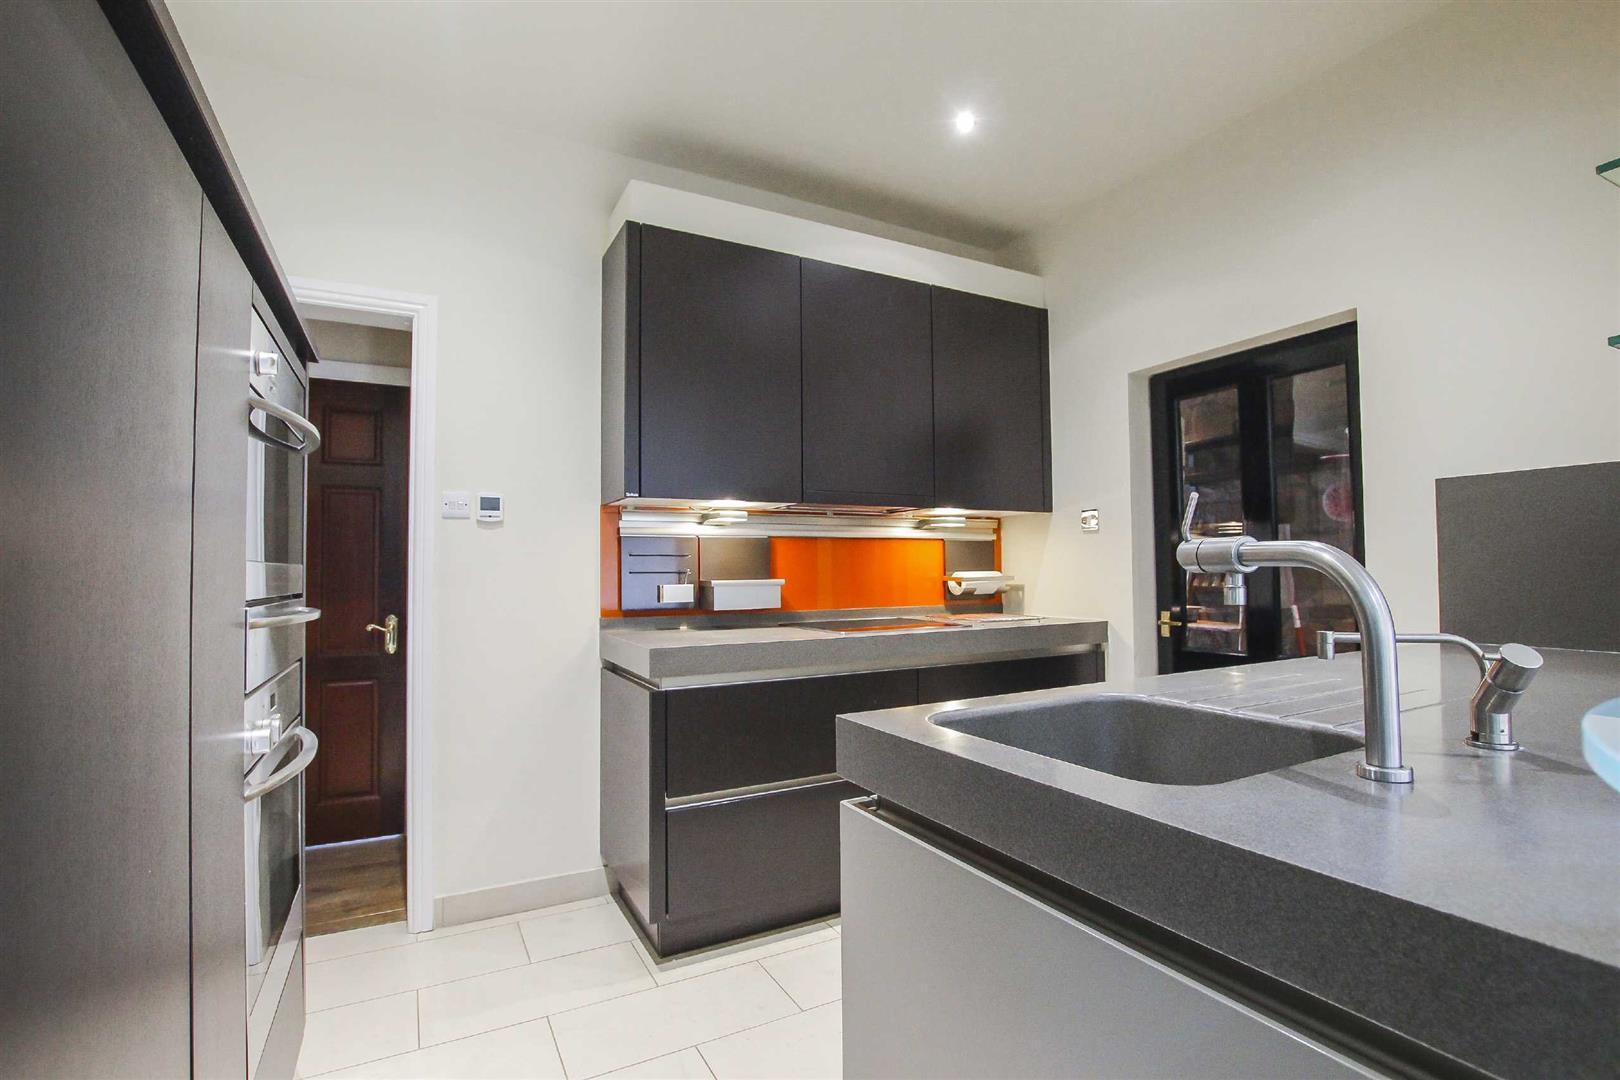 2 Bedroom Detached House For Sale - Image 14